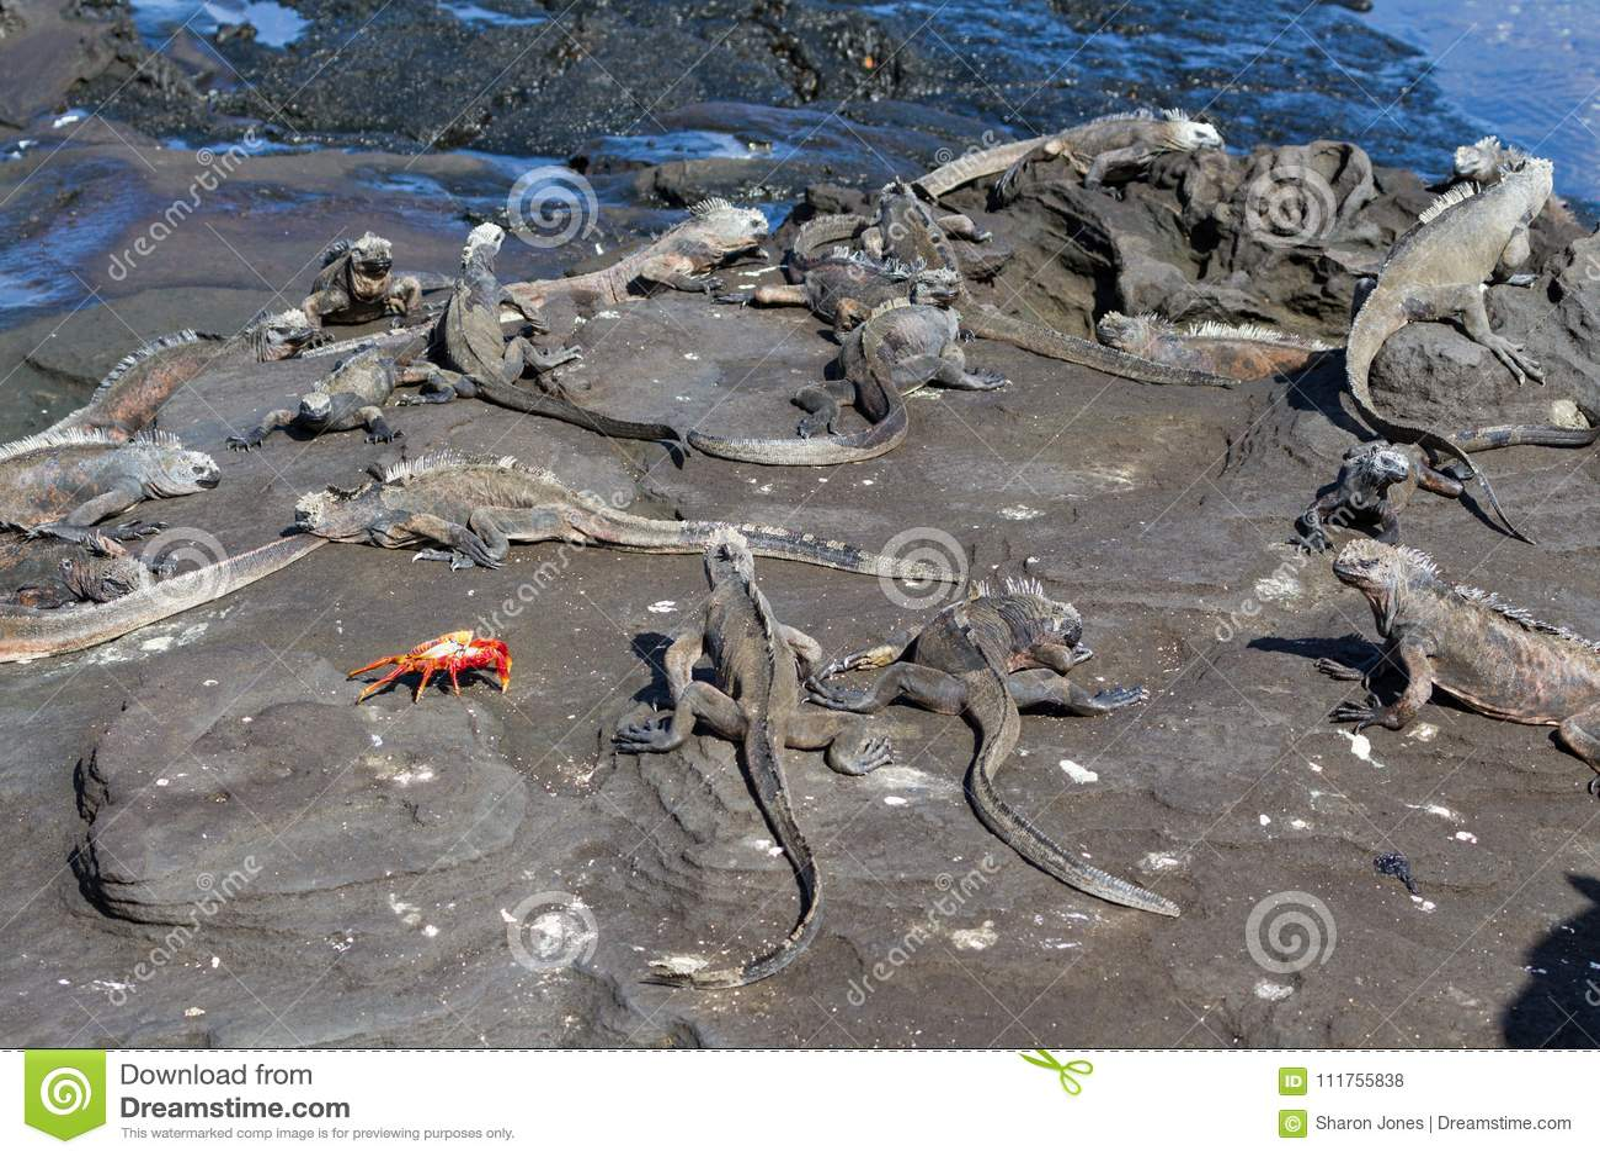 Galapagos Marine Iguanas Amblyrhynchus cristatus with a Sally Lightfoot Crab on lava rock, Galapagos Islands